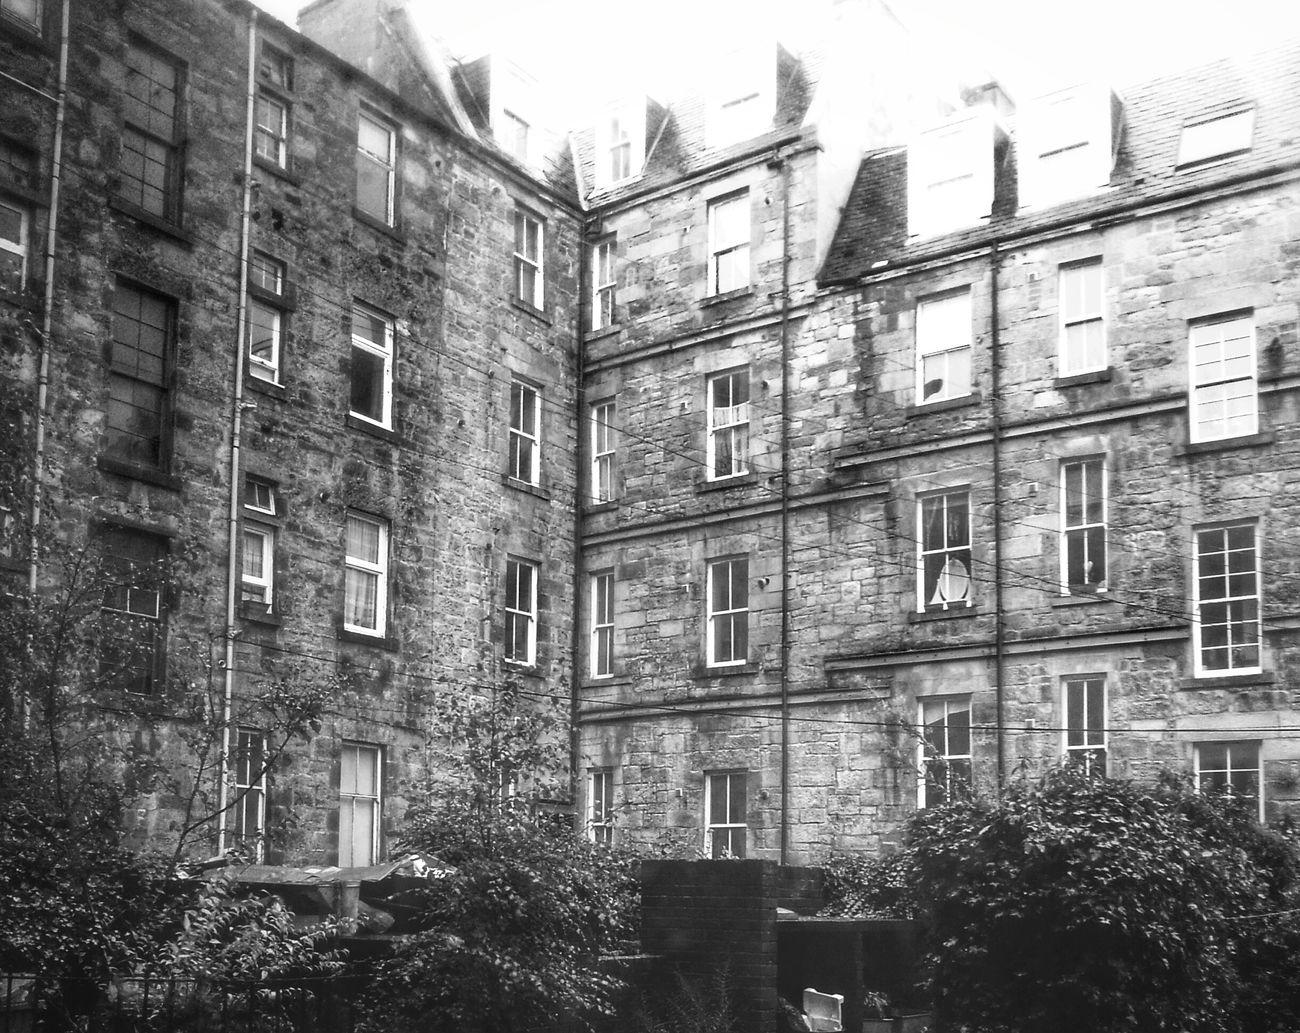 Tenements Blackandwhite